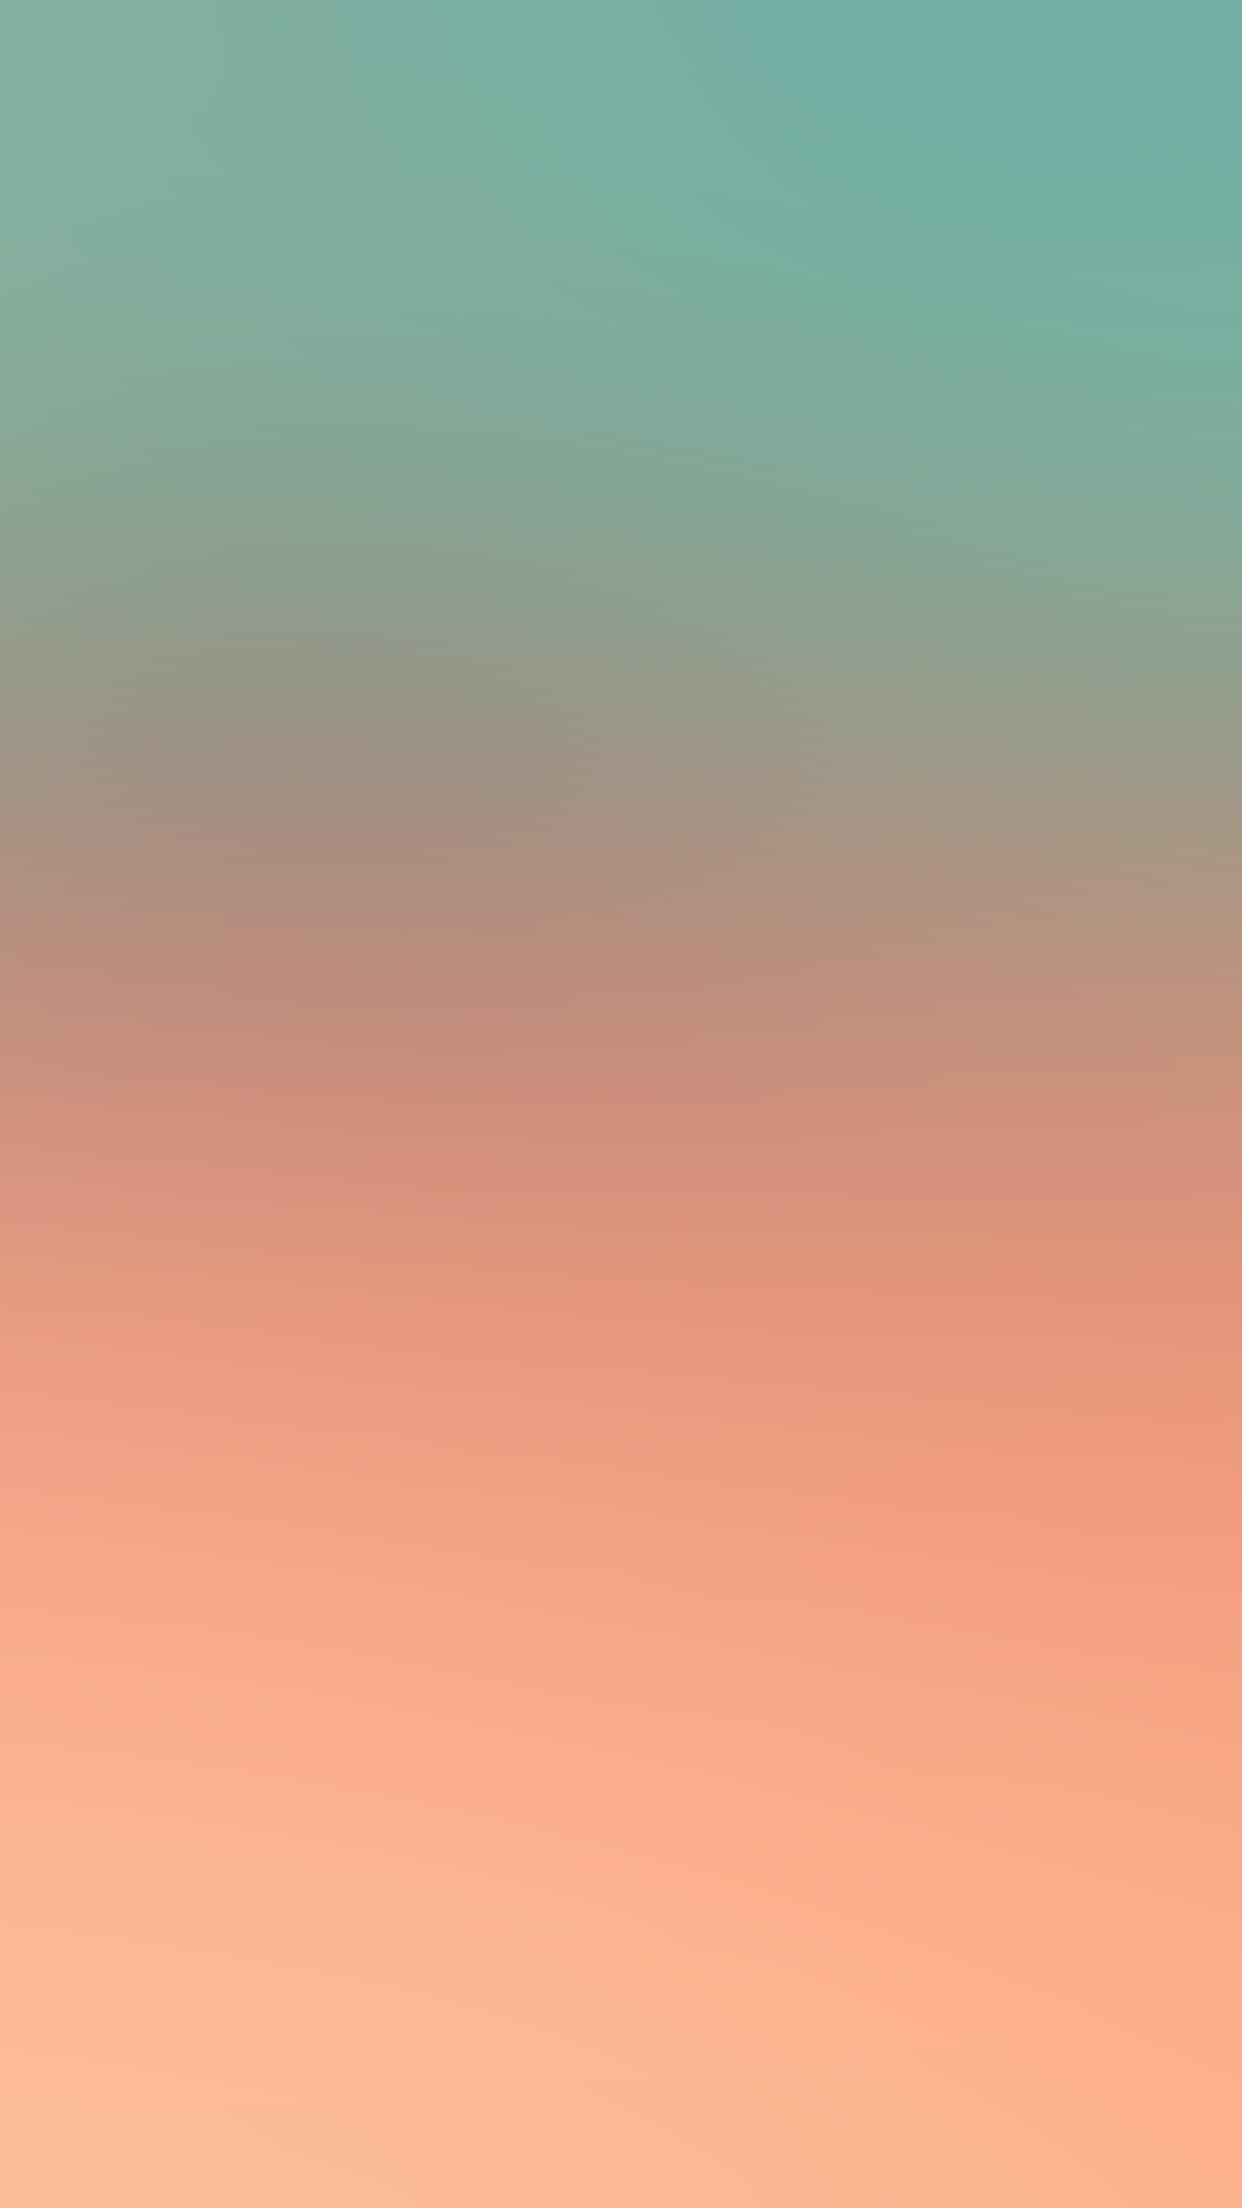 papers.co si52 green orange soft pastel gradation blur 34 iphone6 plus wallpaper